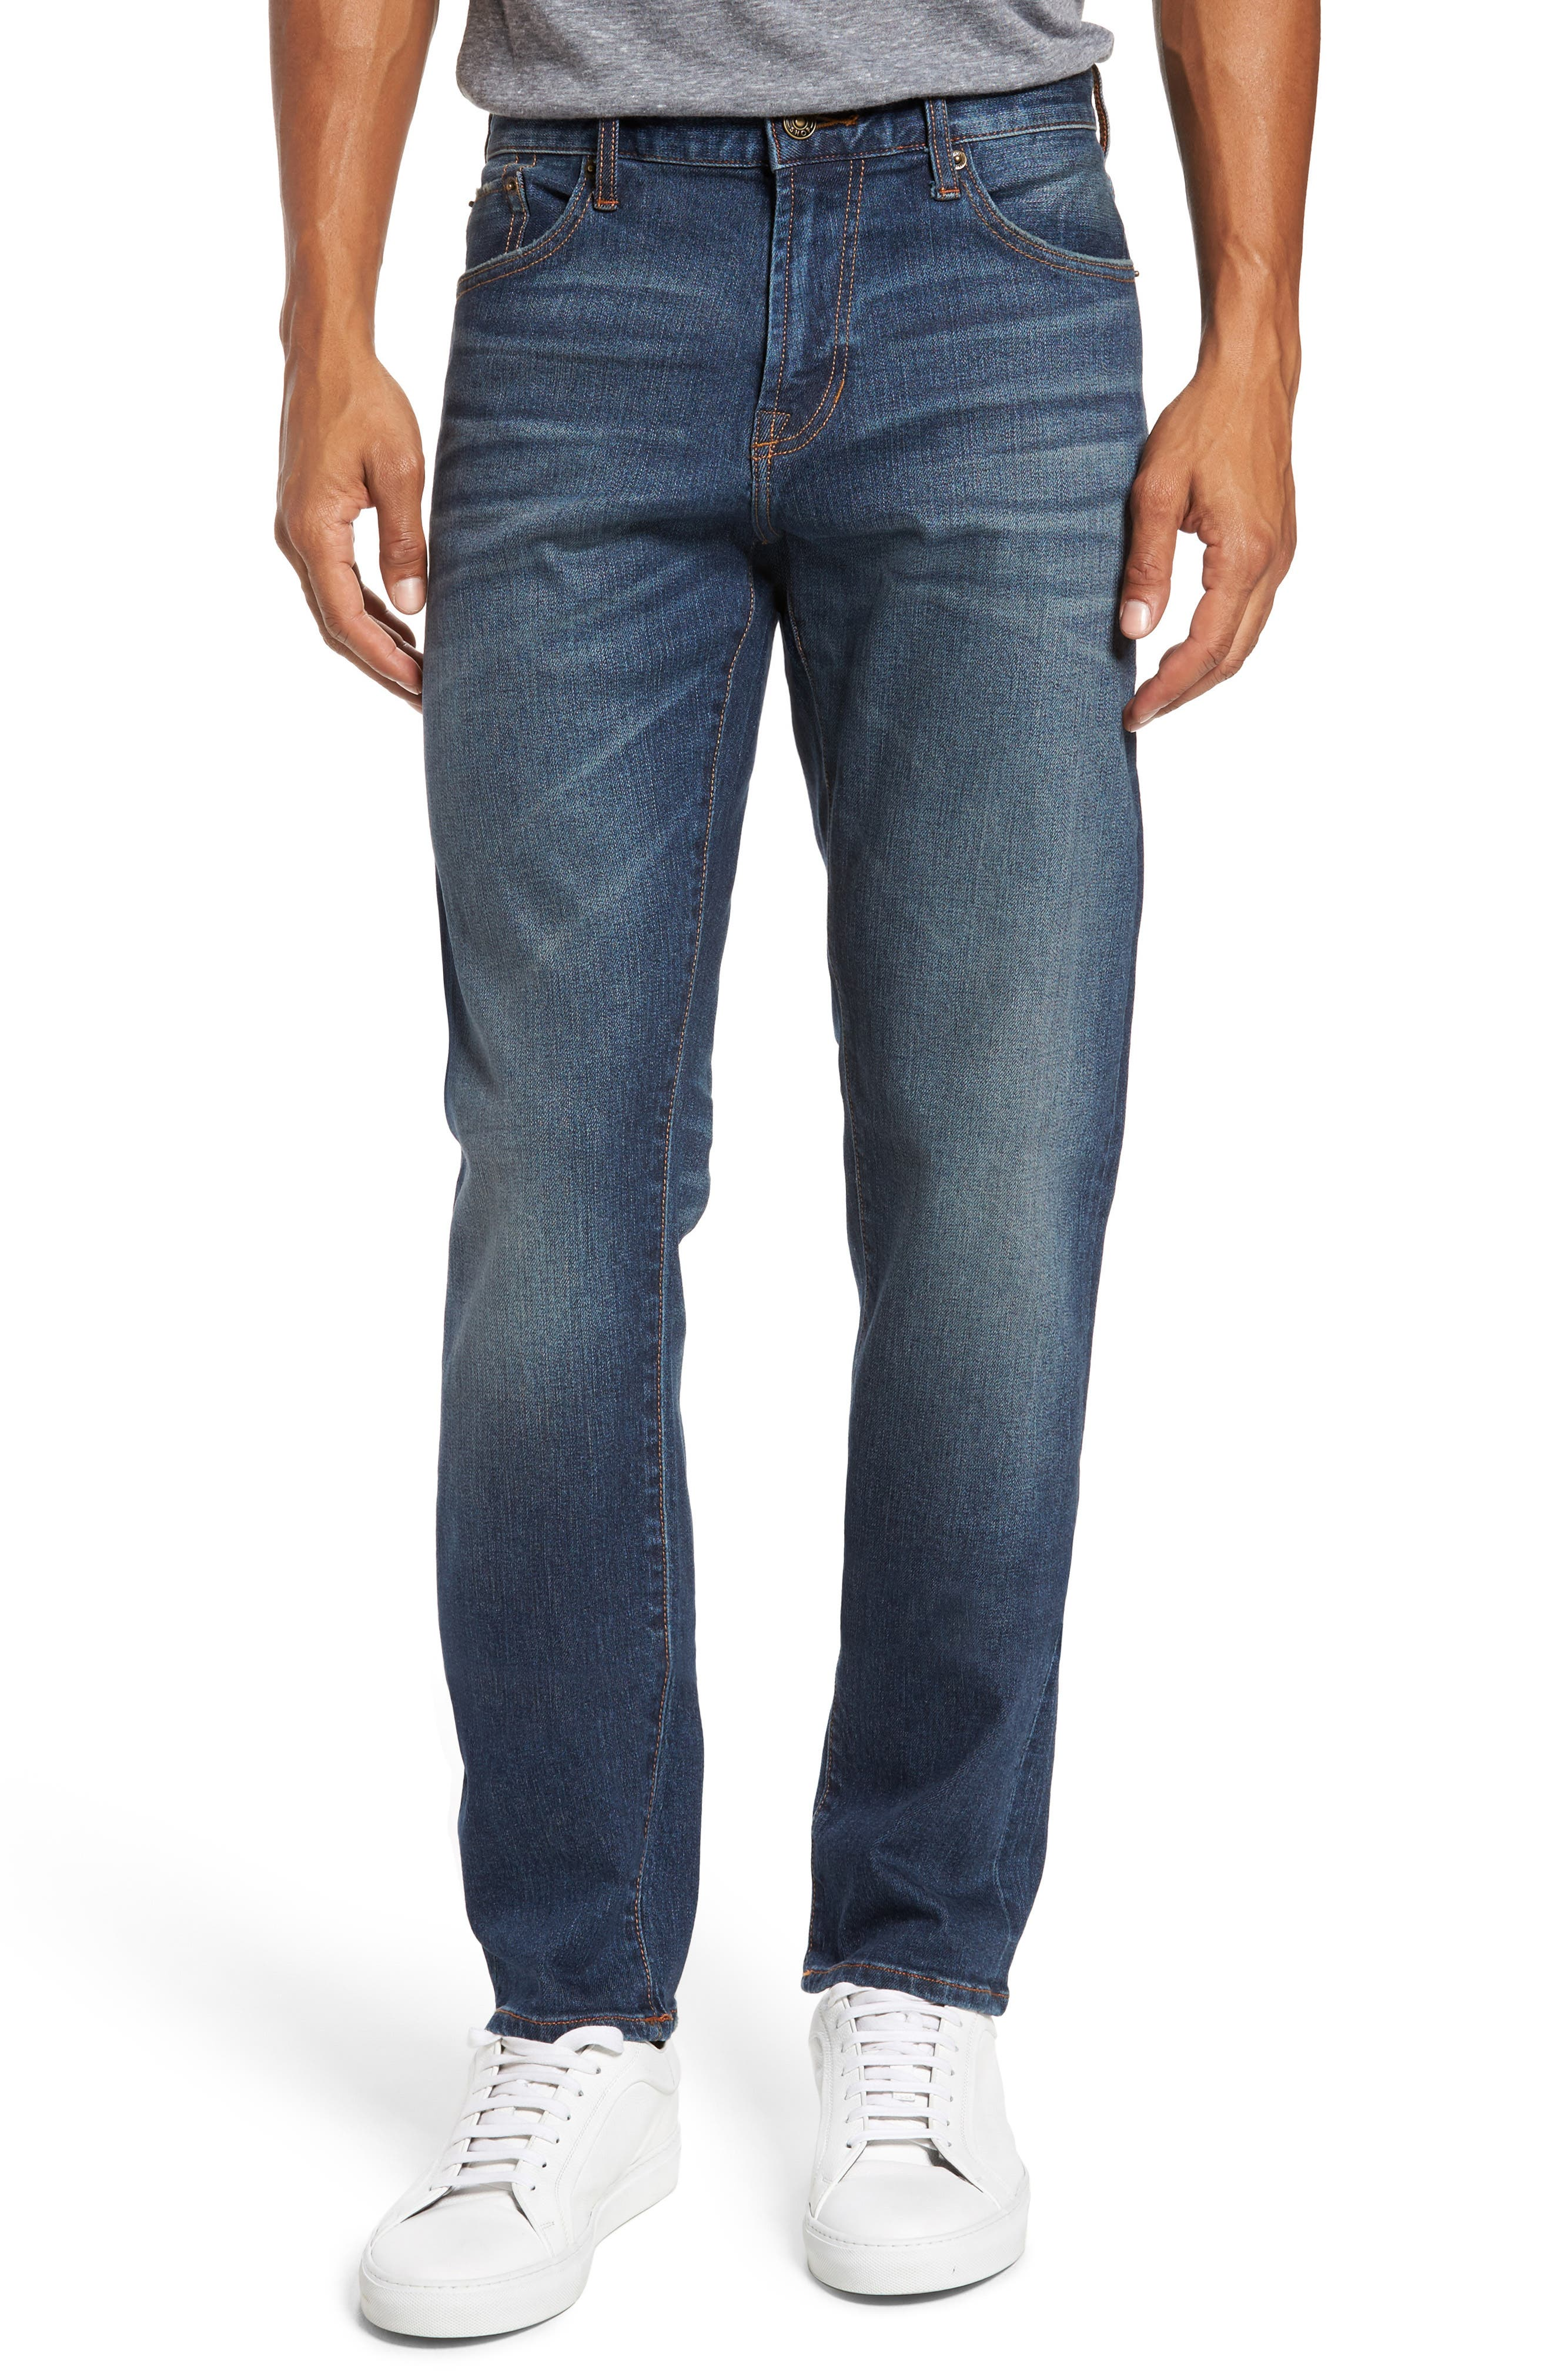 Jean Shop Slim Straight Leg Jeans (Albany)